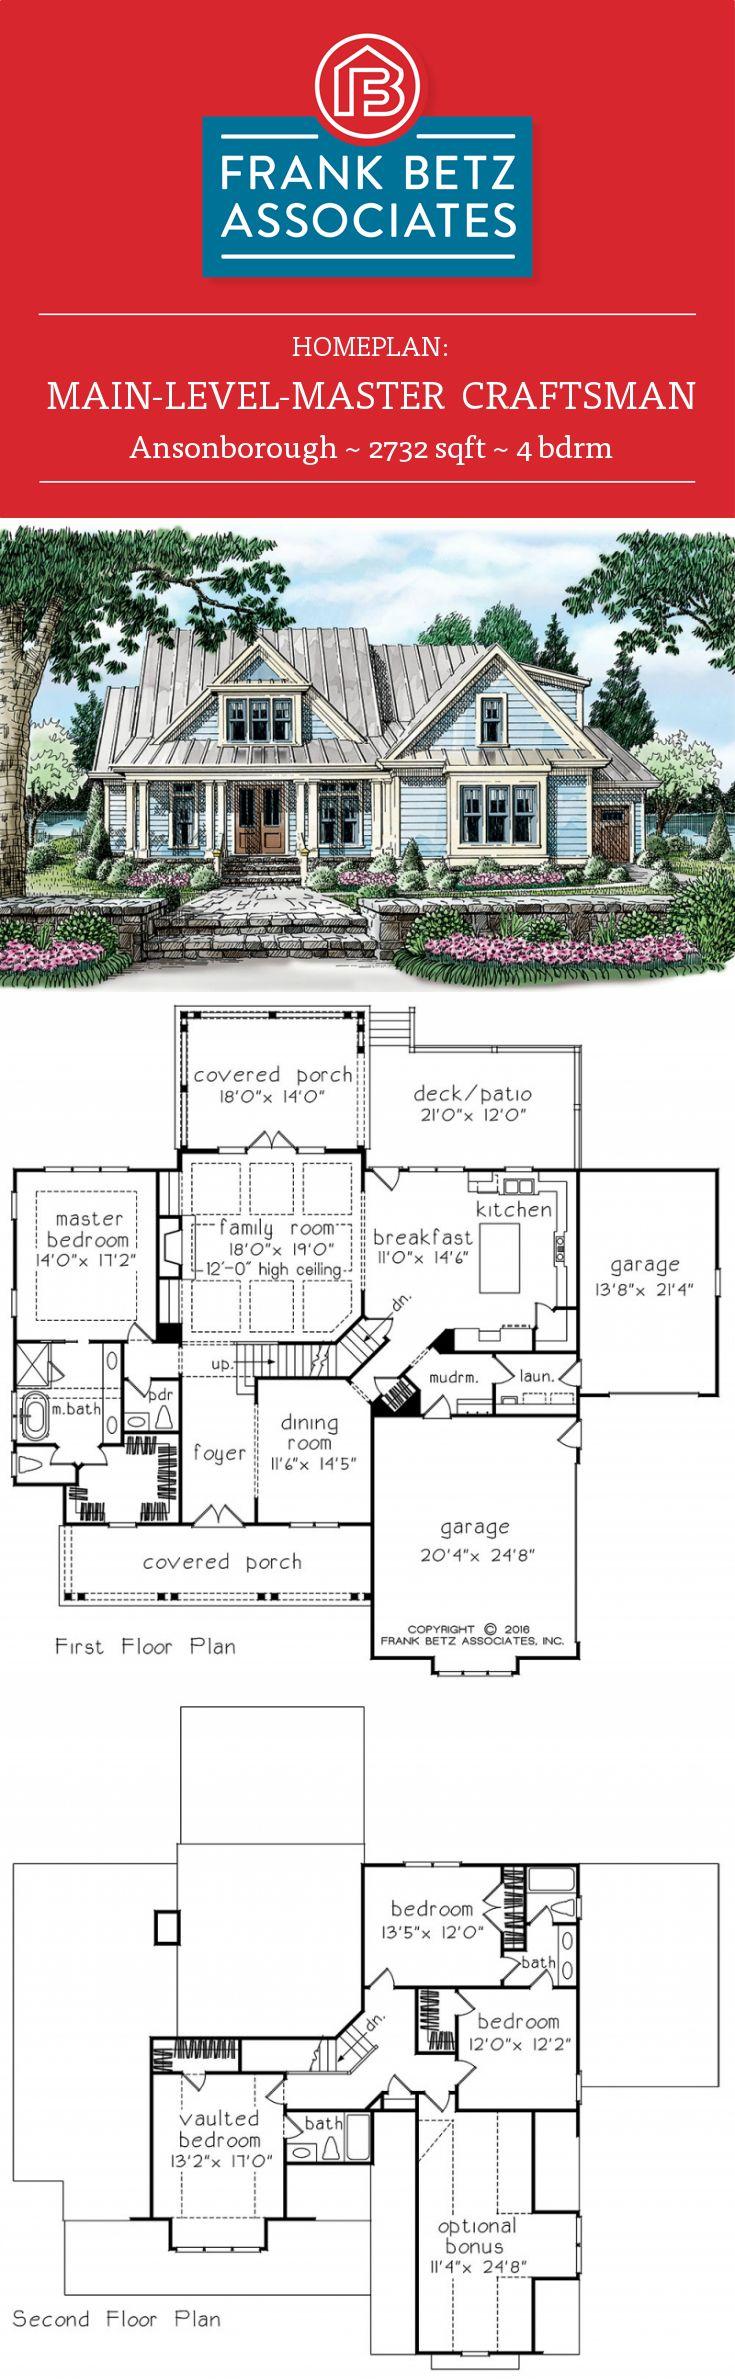 Ansonborough 2732 Sqft 4 Bdrm Main Level Master Craftsman Southern Living House Plan Southern House Plans Southern Living House Plans Craftsman House Plans